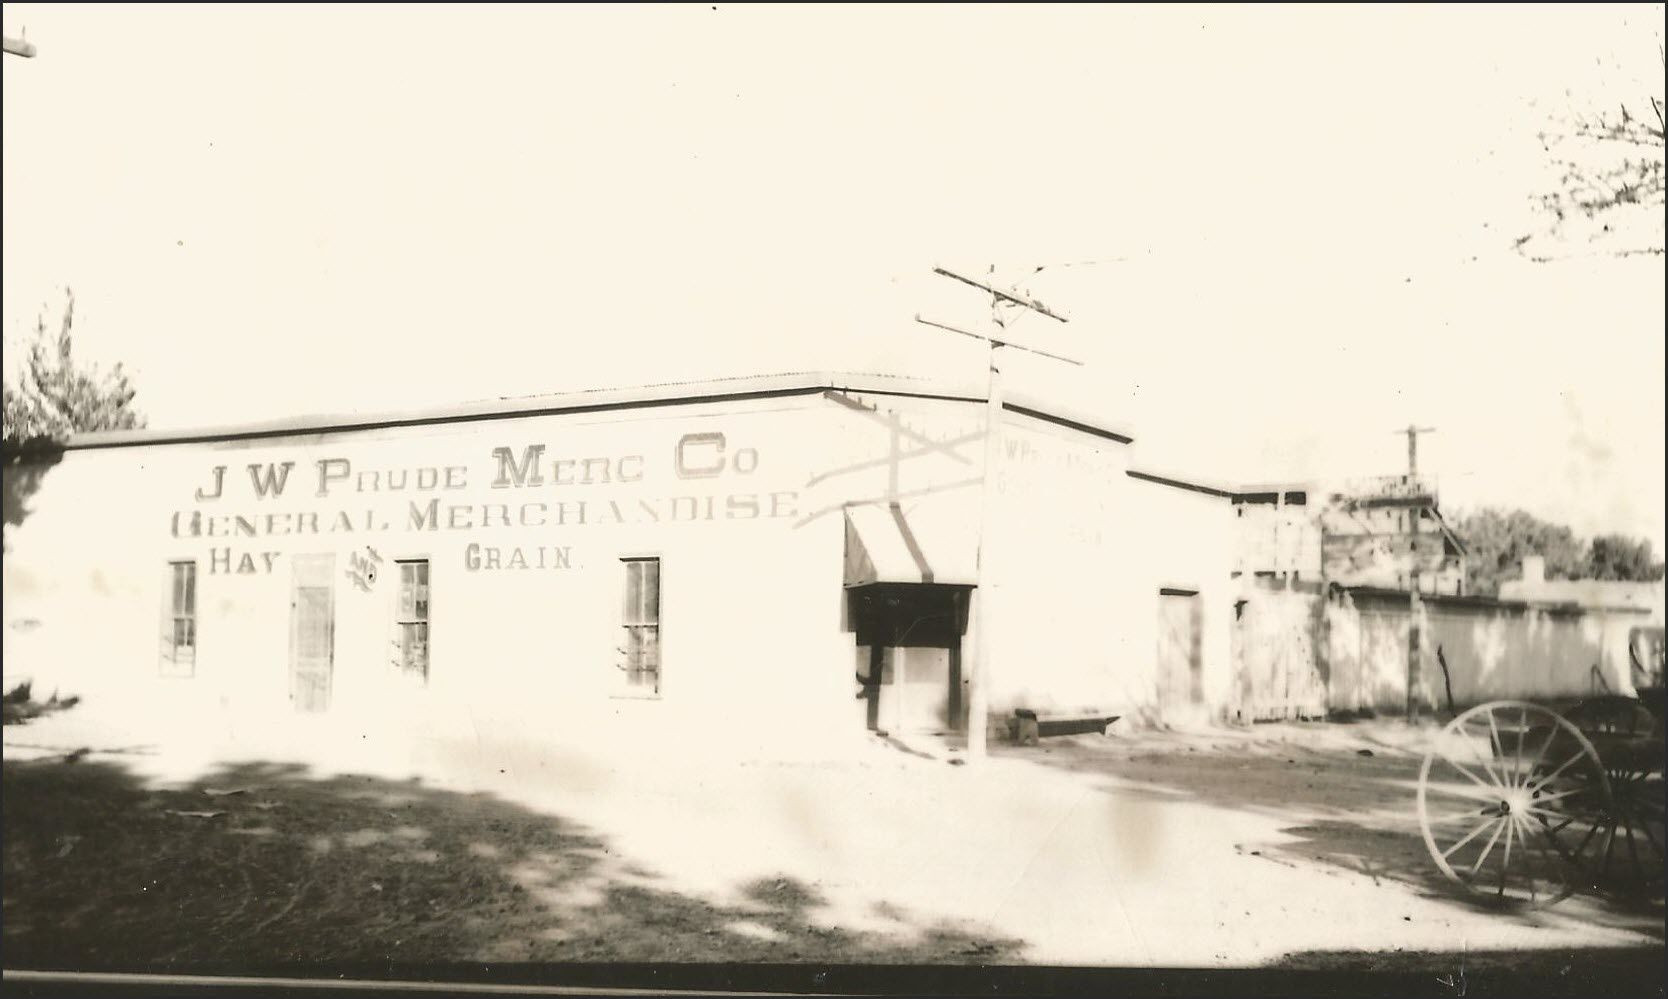 The J.W. Prude Merc Co on Granado Street.